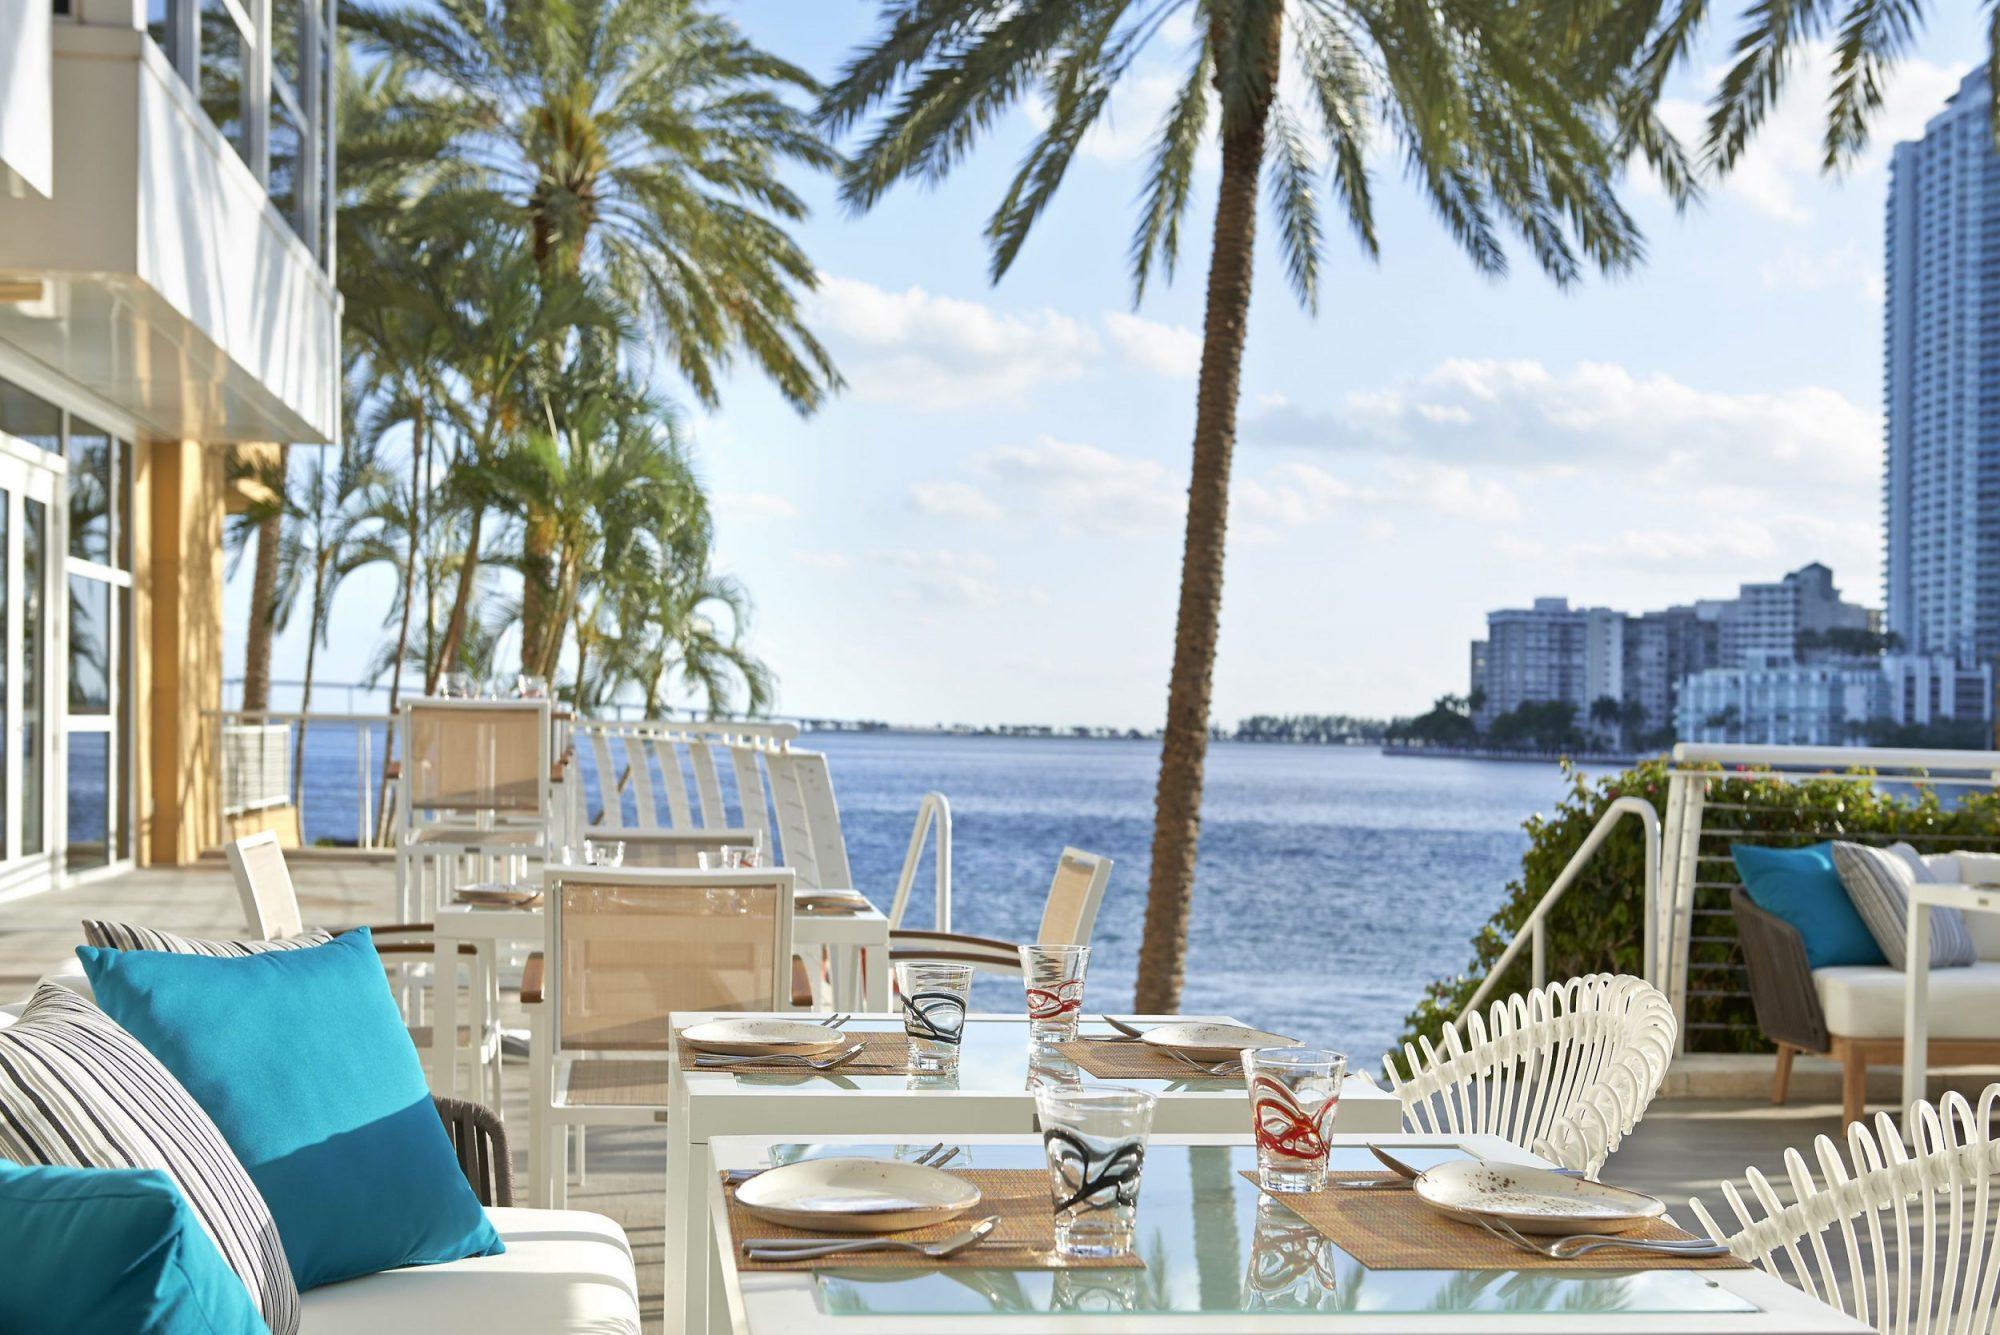 vue La mar brickell mandarin oriental restaurants avec vue table avec vue skyline de Miami vue mer plein les yeux blog miami off road